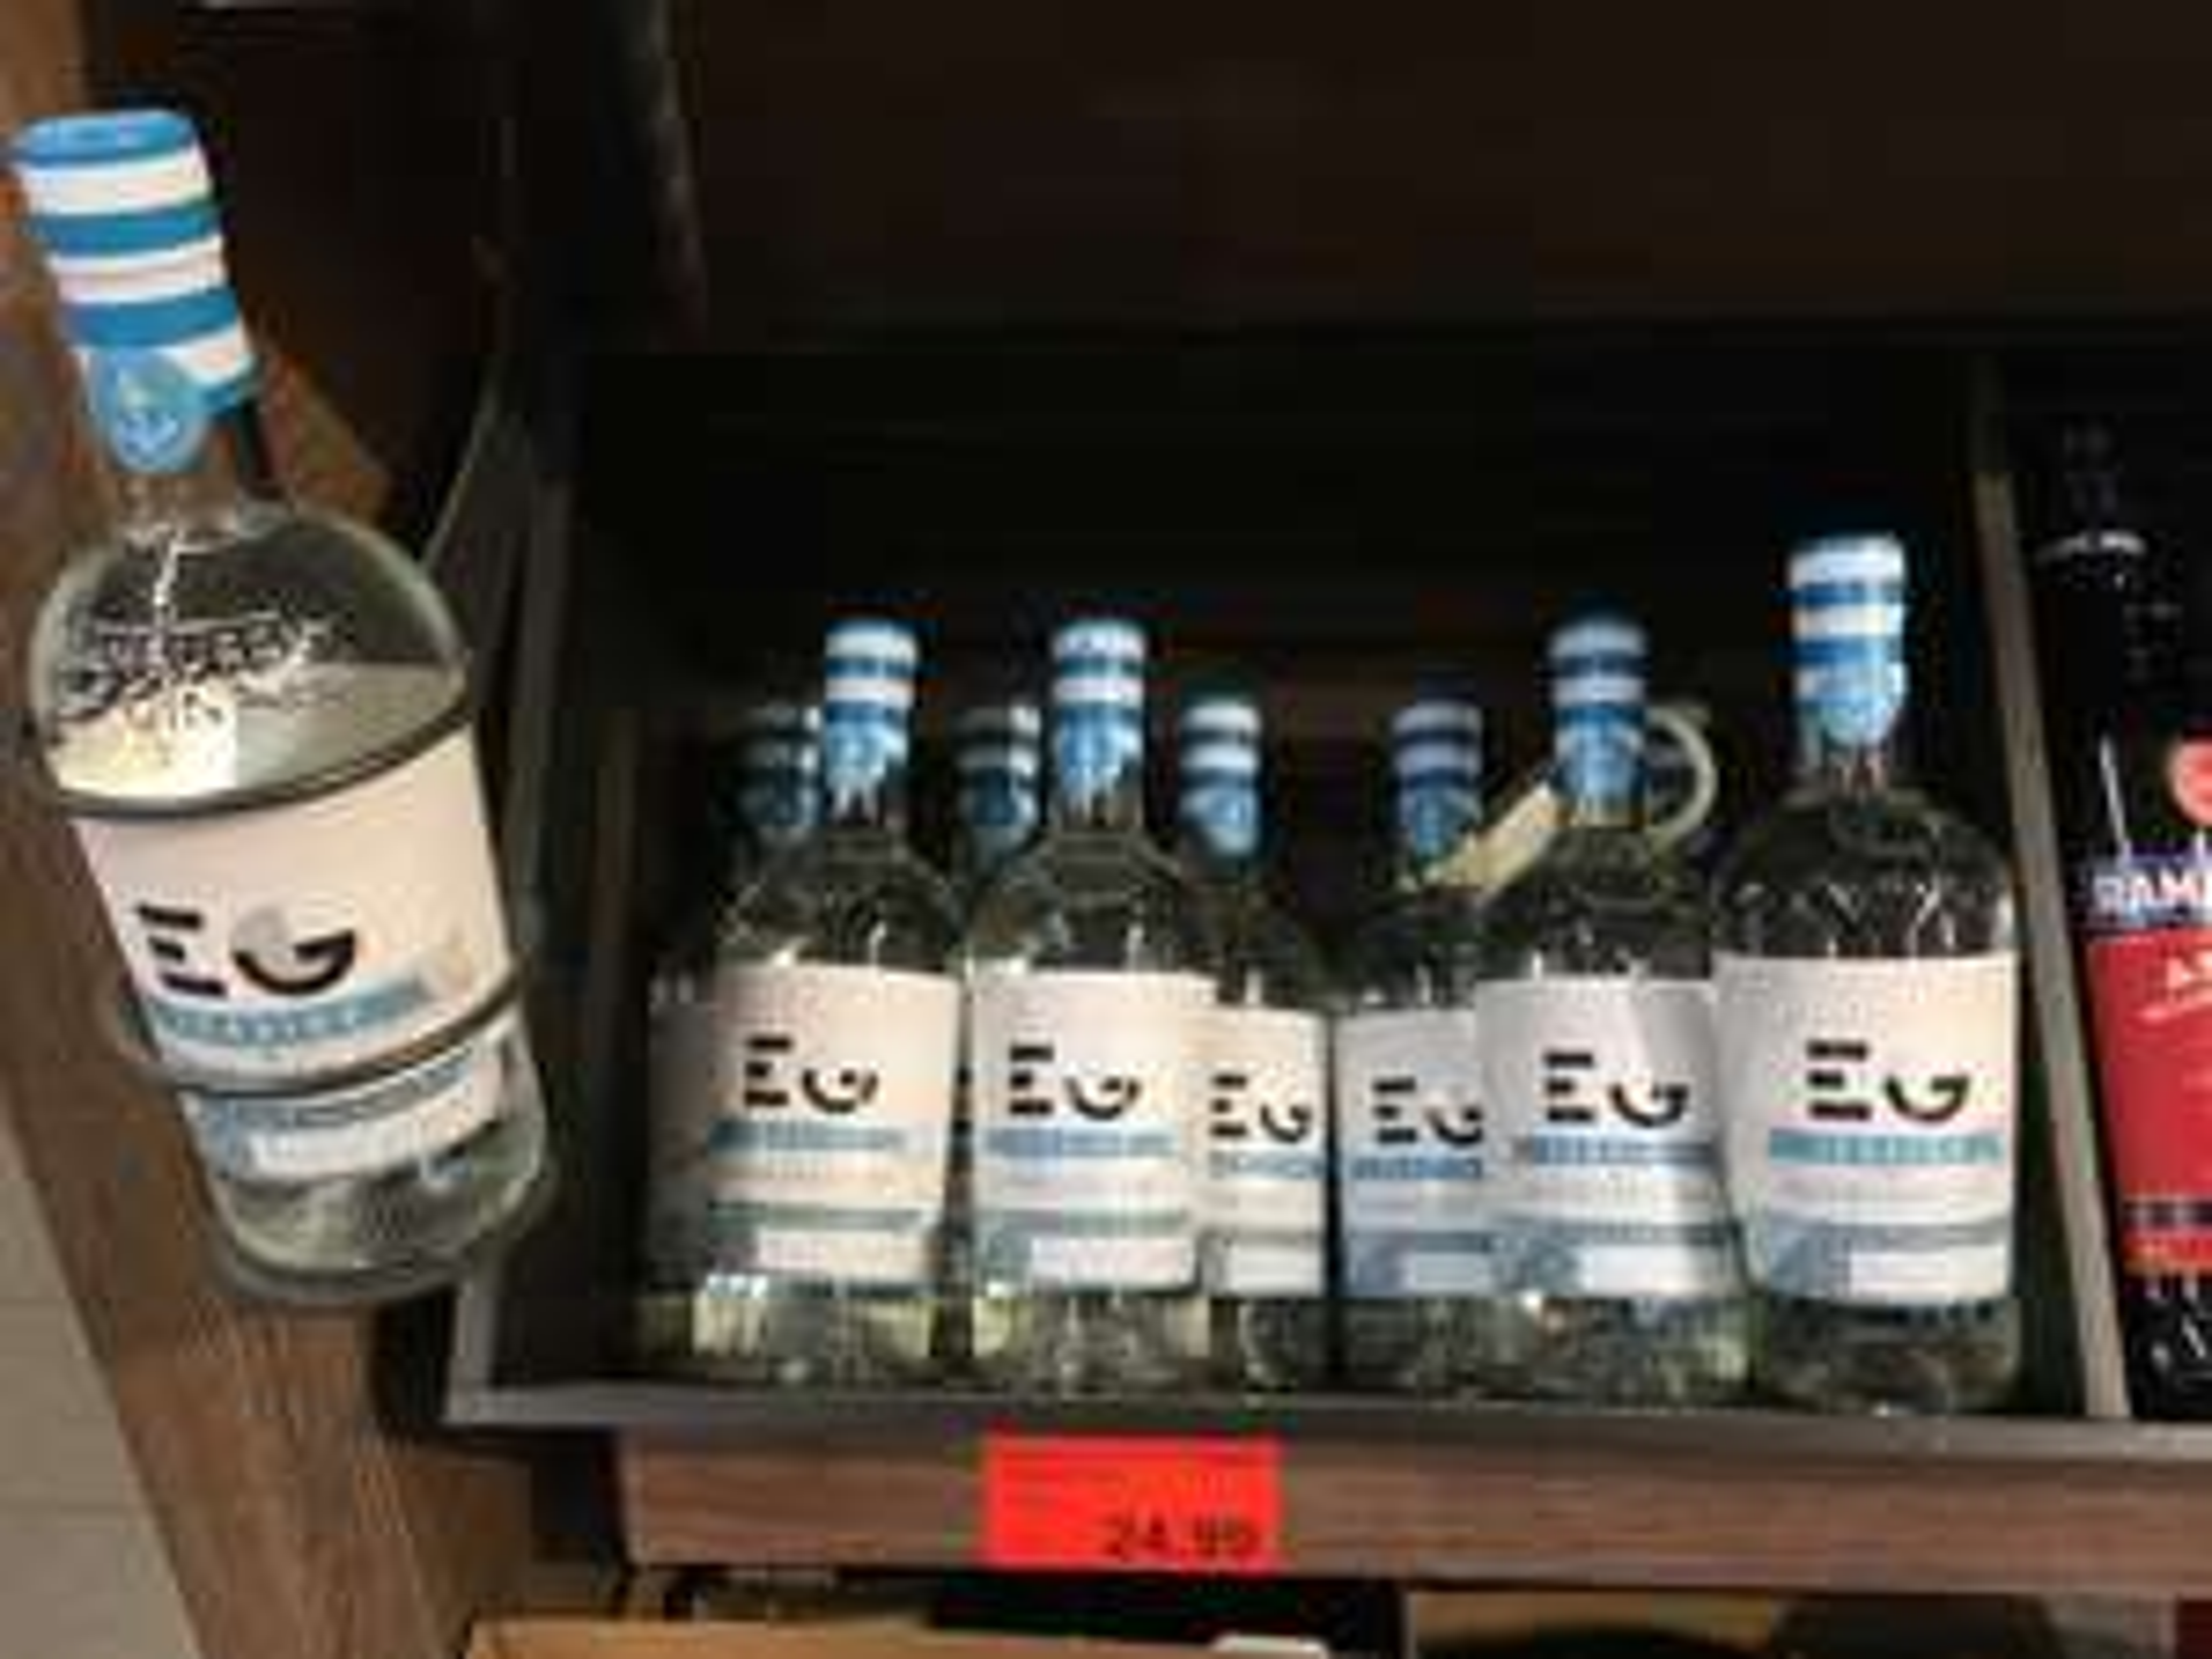 [Aldi Nord] Edinburgh Seaside Gin